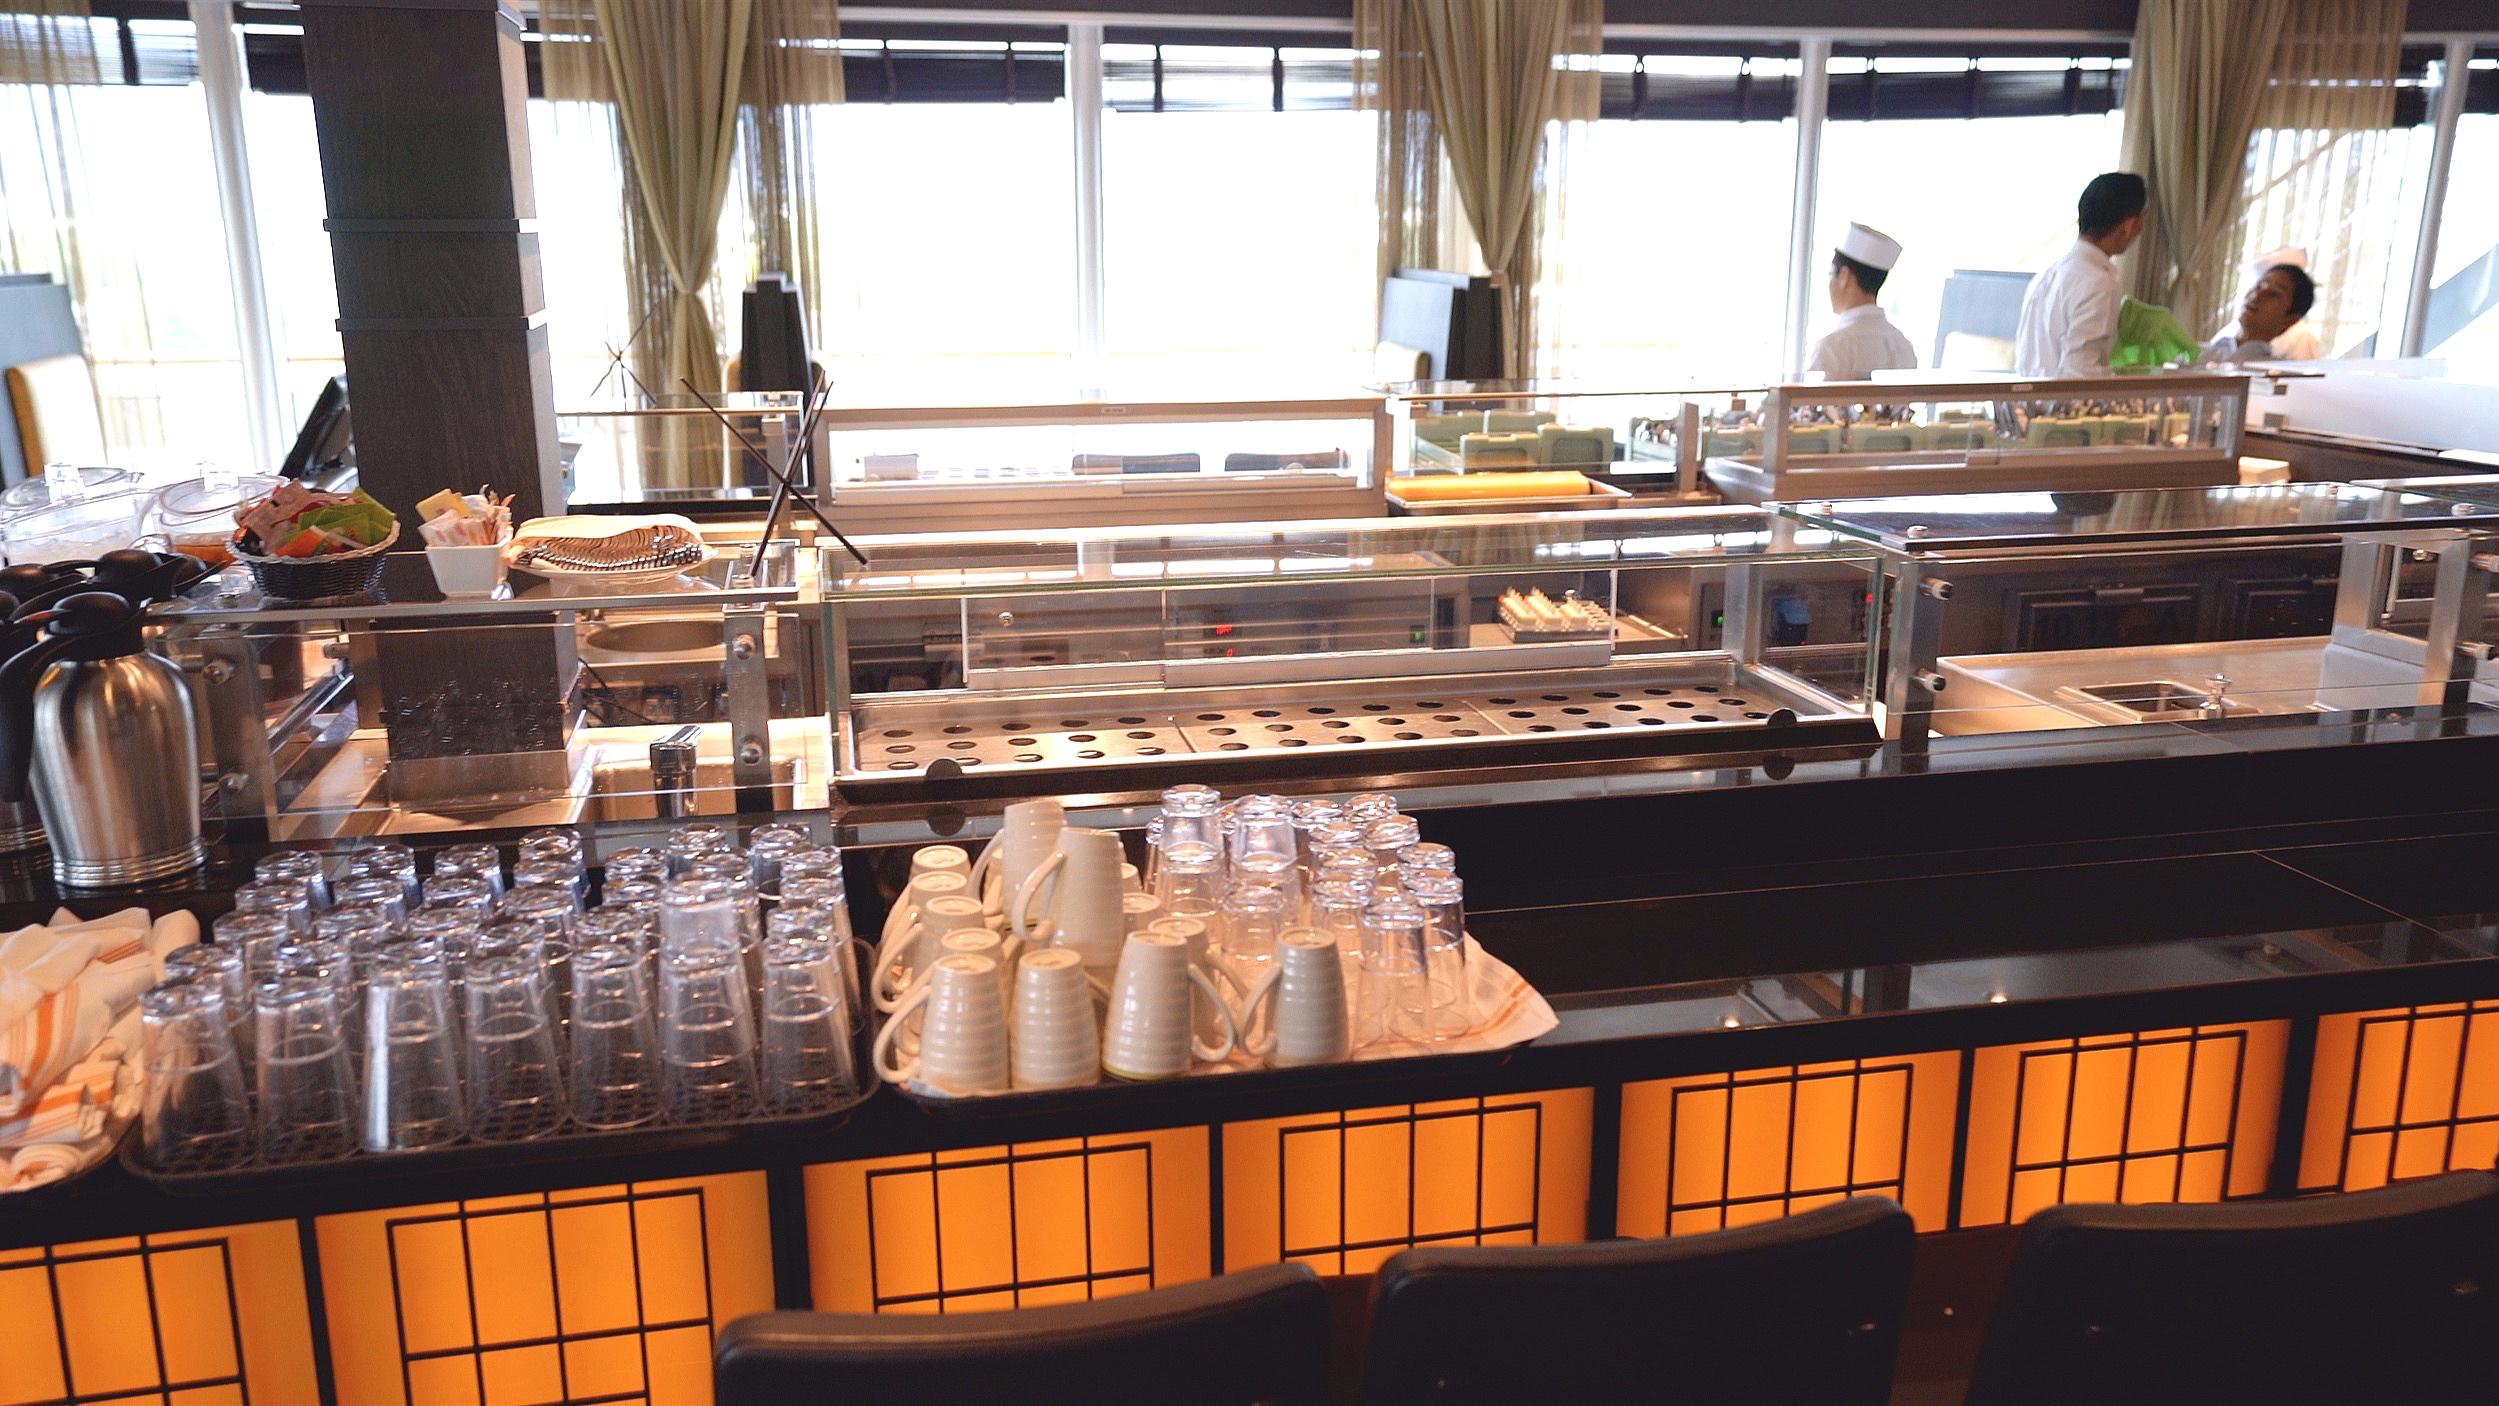 Tamarind and Nami Sushi preparation bar.